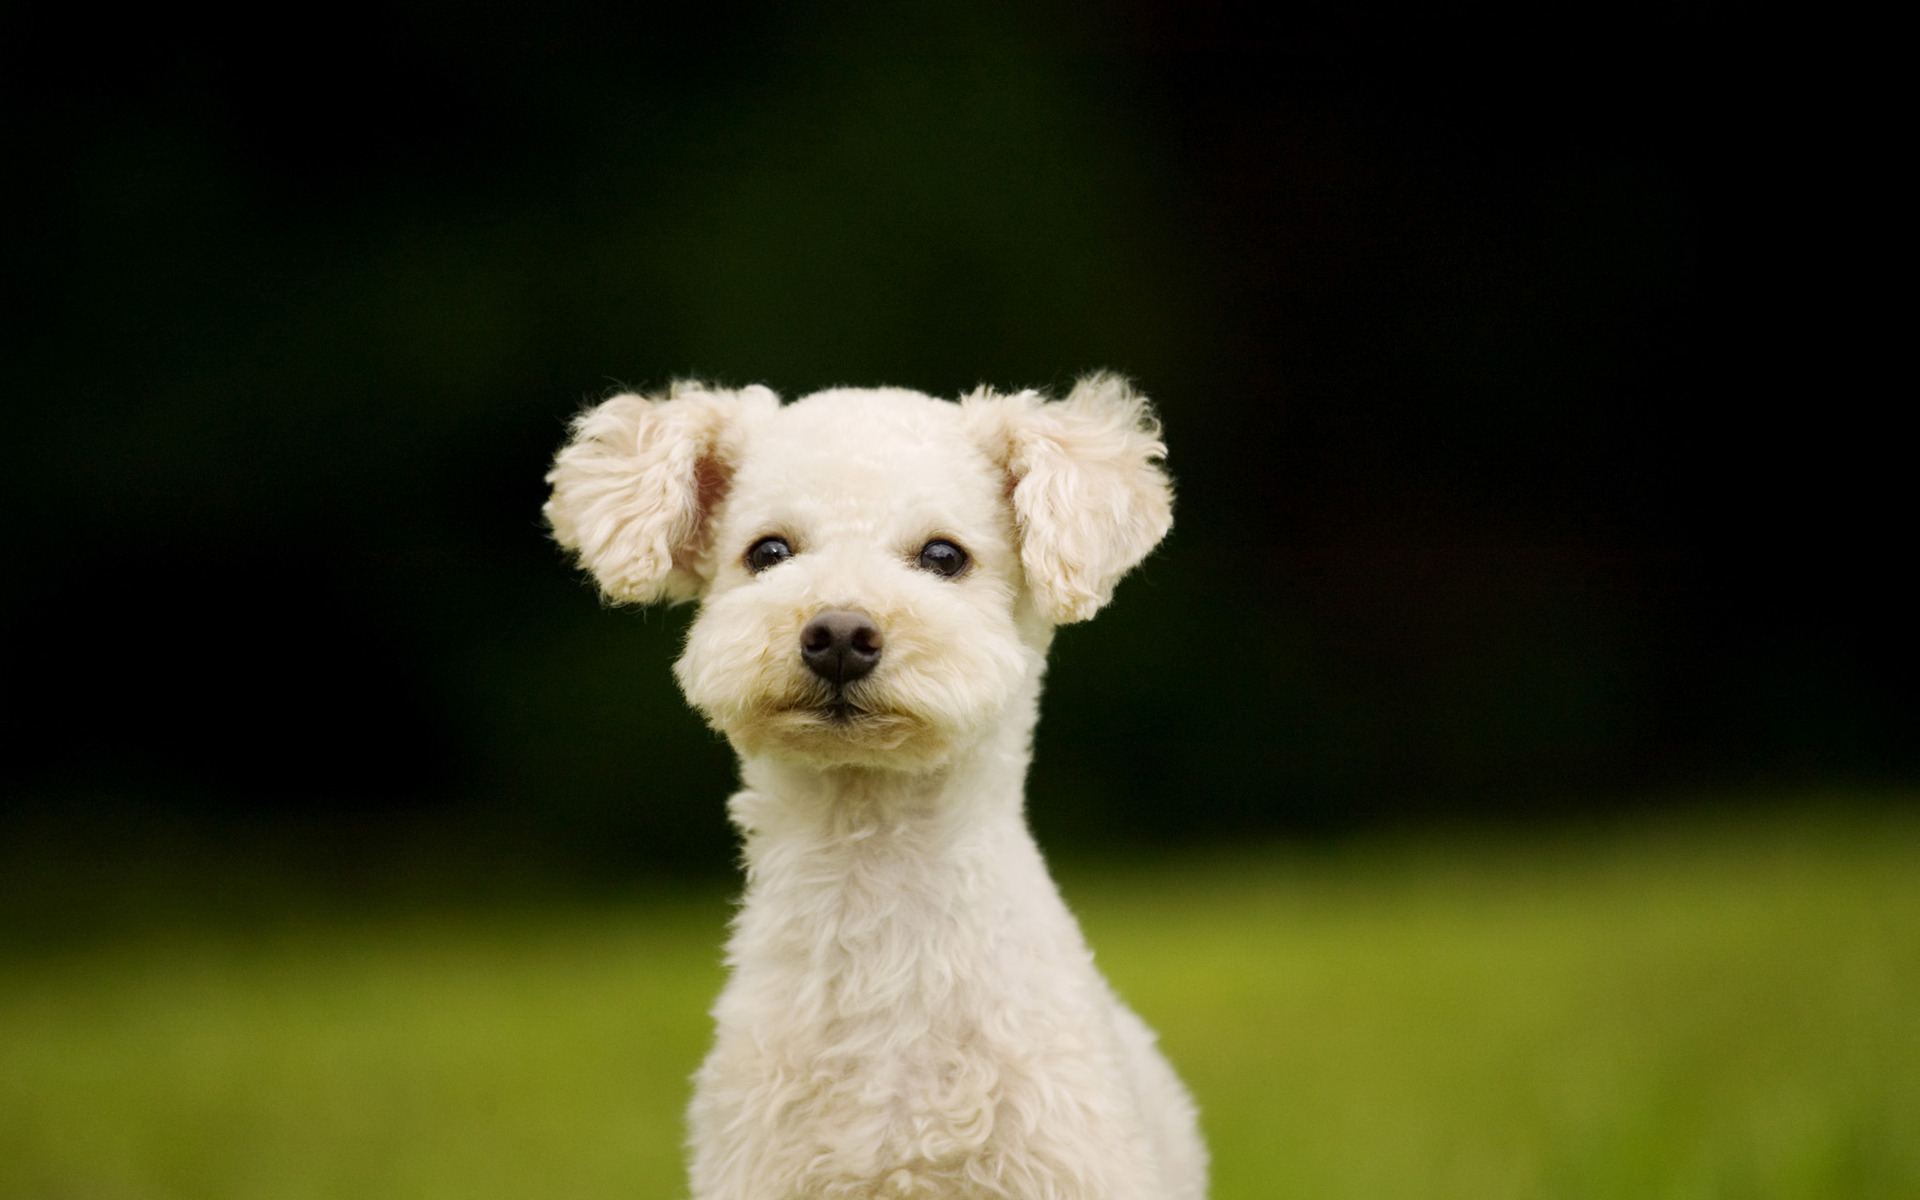 White dog / 1920 x 1200 / Animals / Photography | MIRIADNA.COM